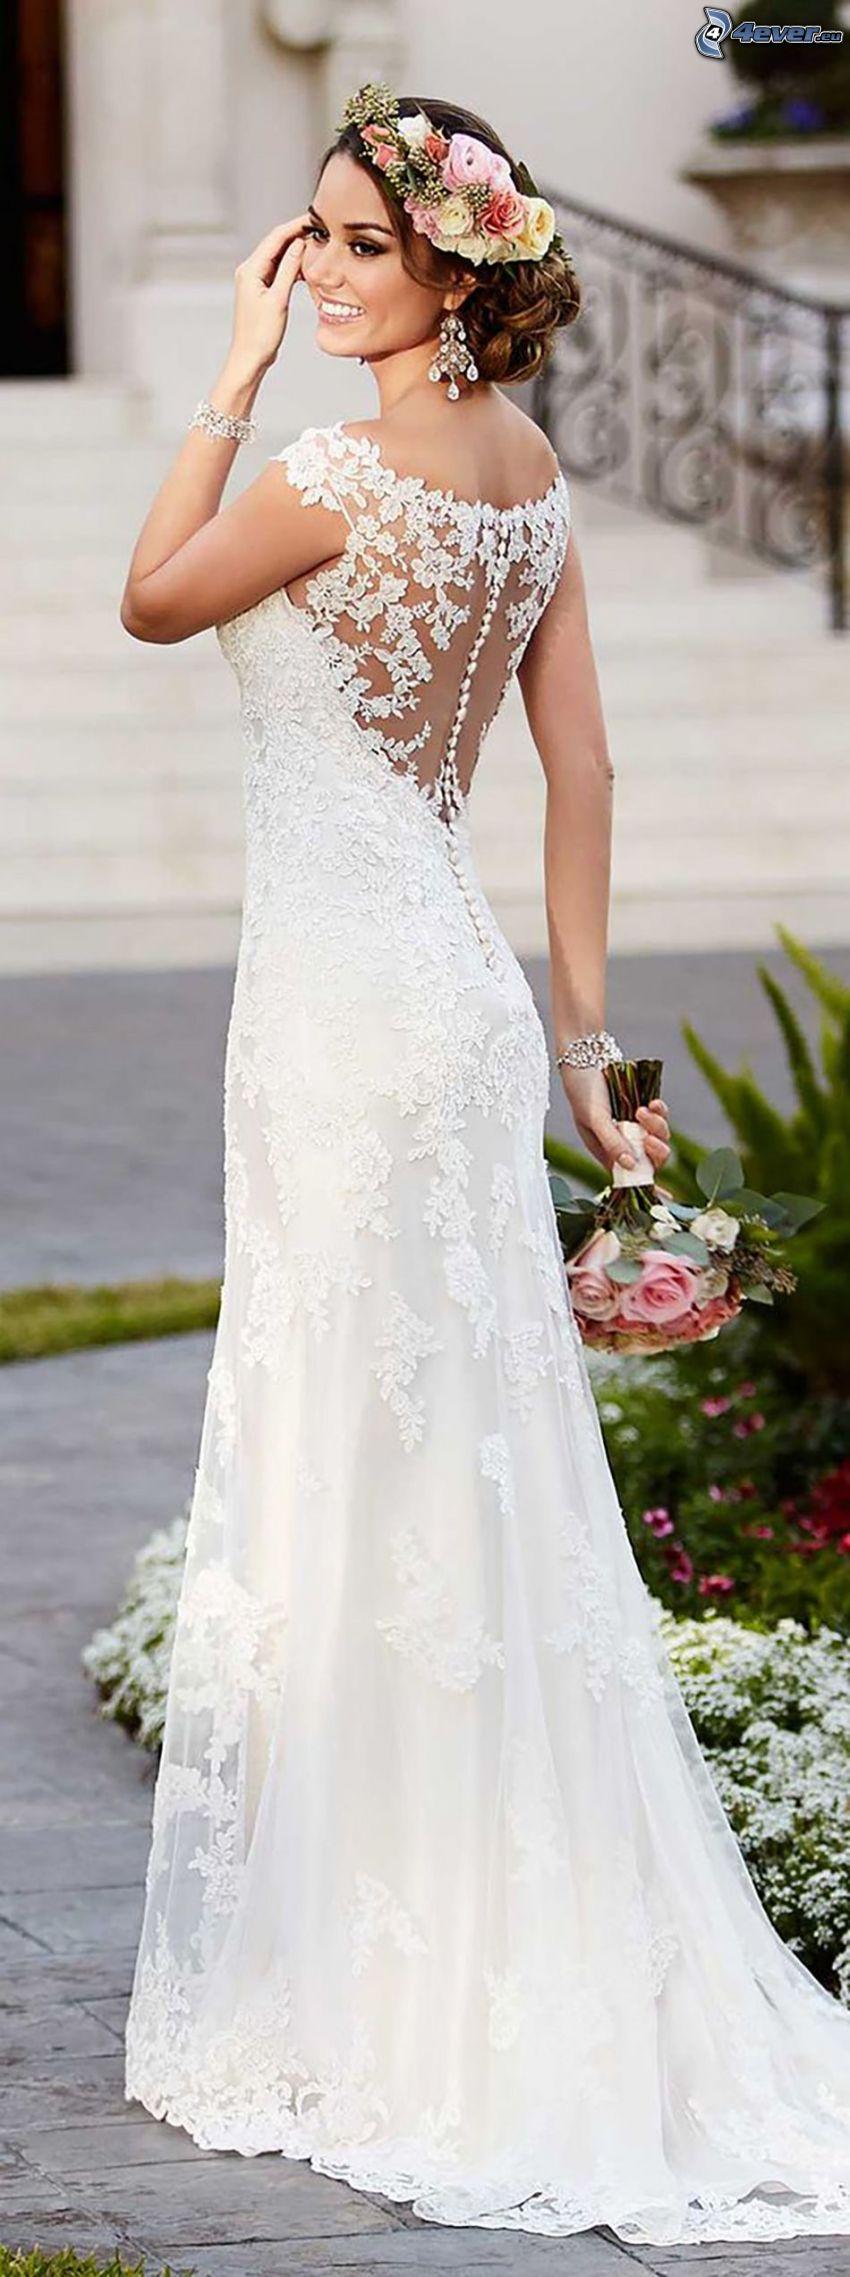 suknia ślubna, panna młoda, bukiet ślubny, opaska